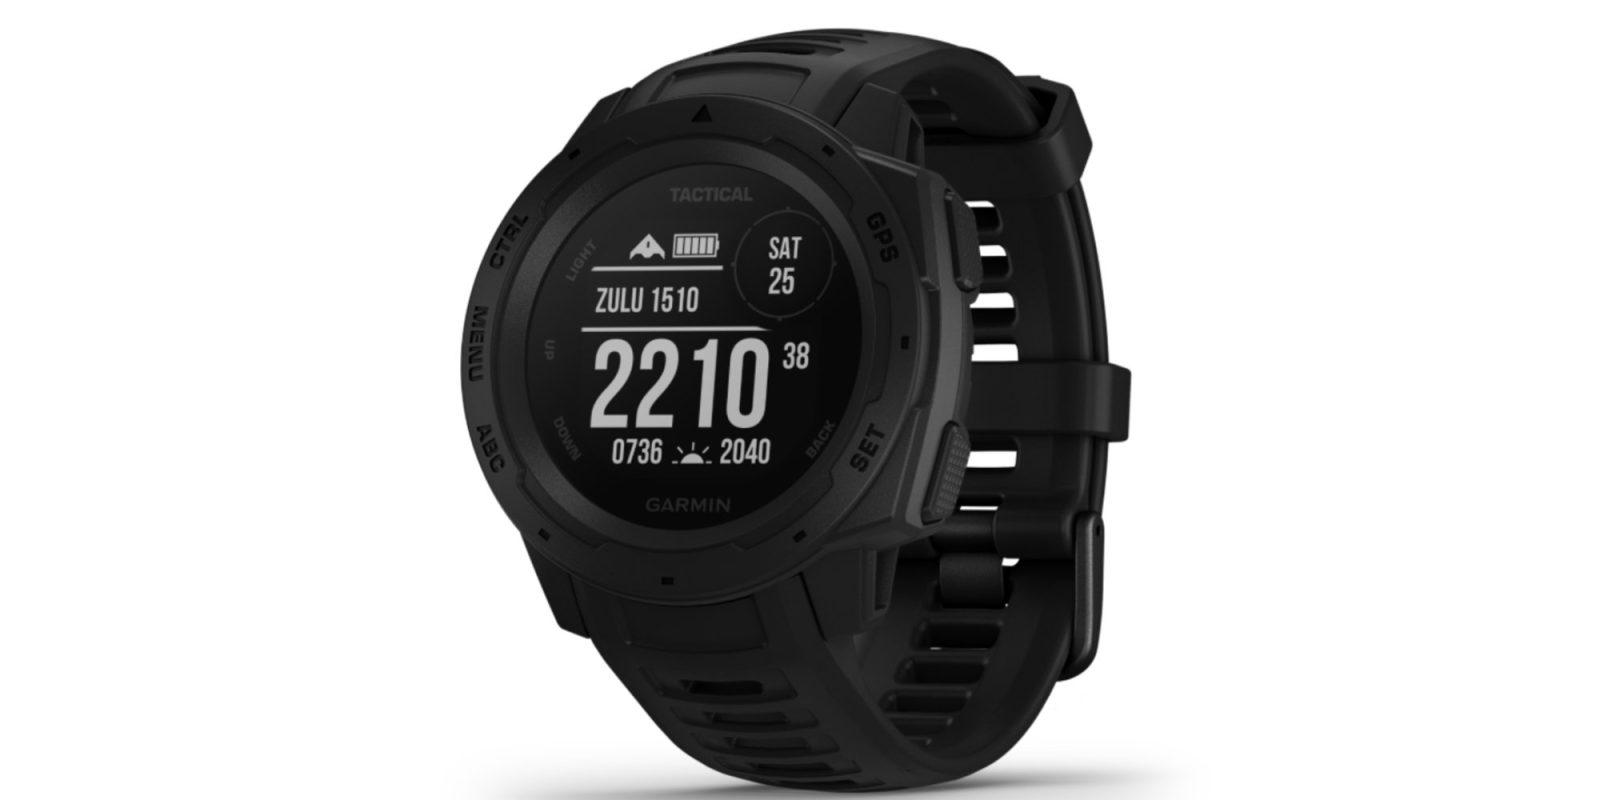 Garmin's rugged Instinct GPS smartwatch hits a new low of $220 (Reg. $300)